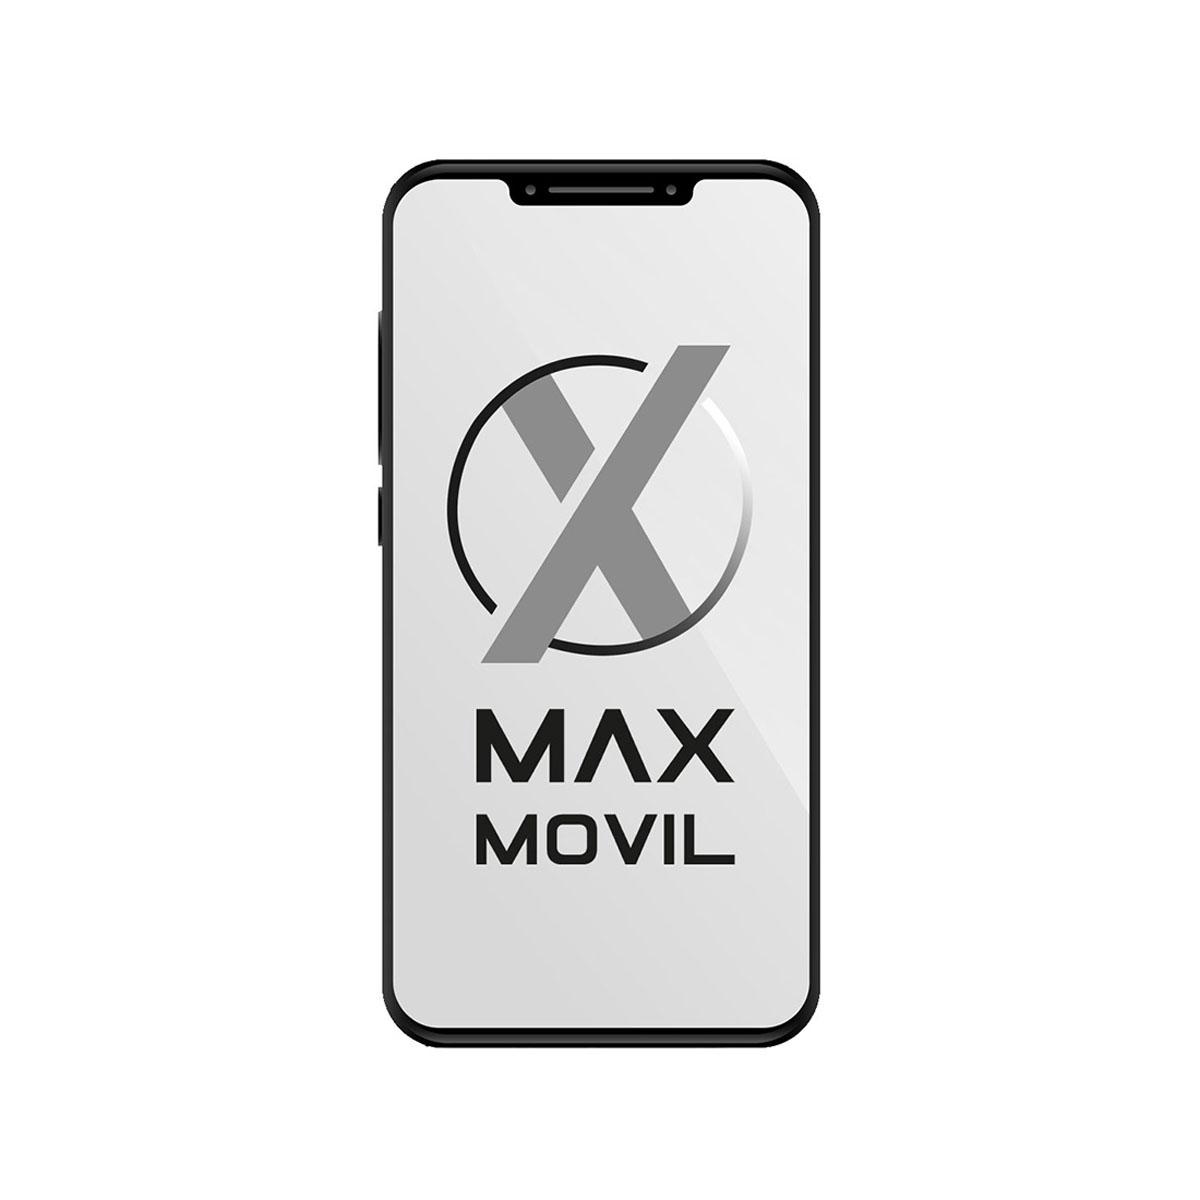 Funda Silicone Case para iPad Mini 4 Piedra MKLP2ZM/A